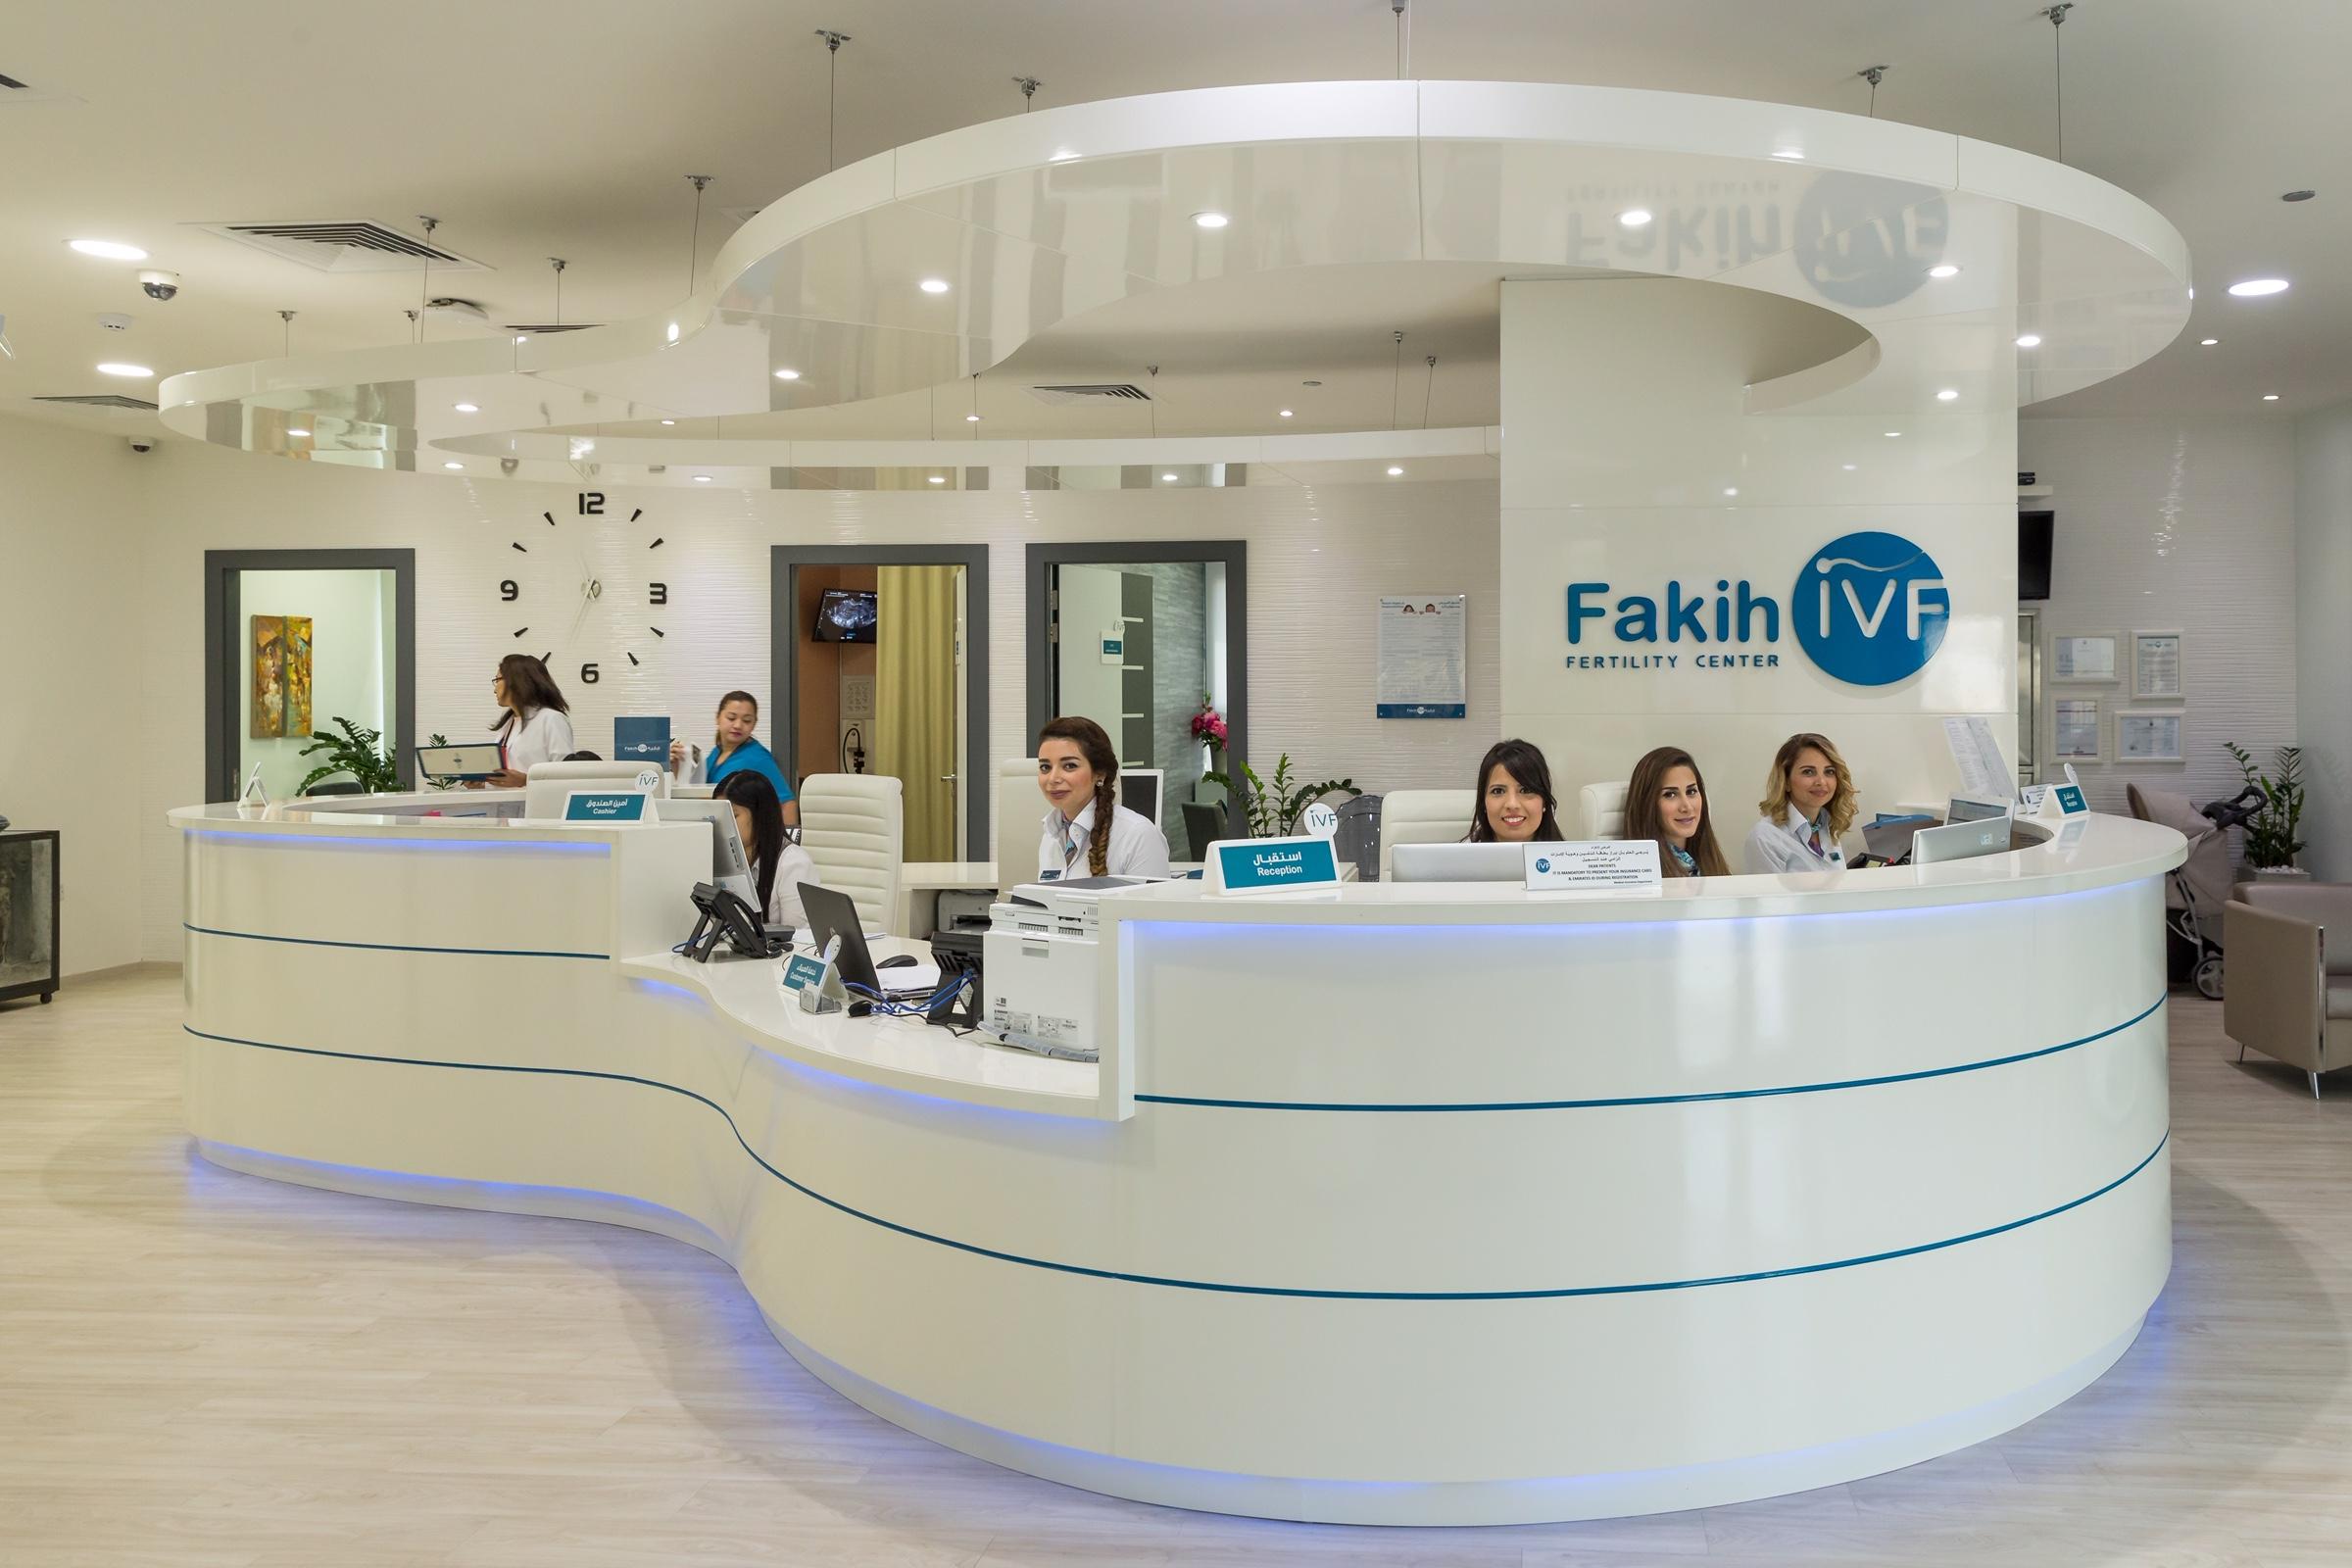 Fakih IVF Fertility Center - Abu Dhabi